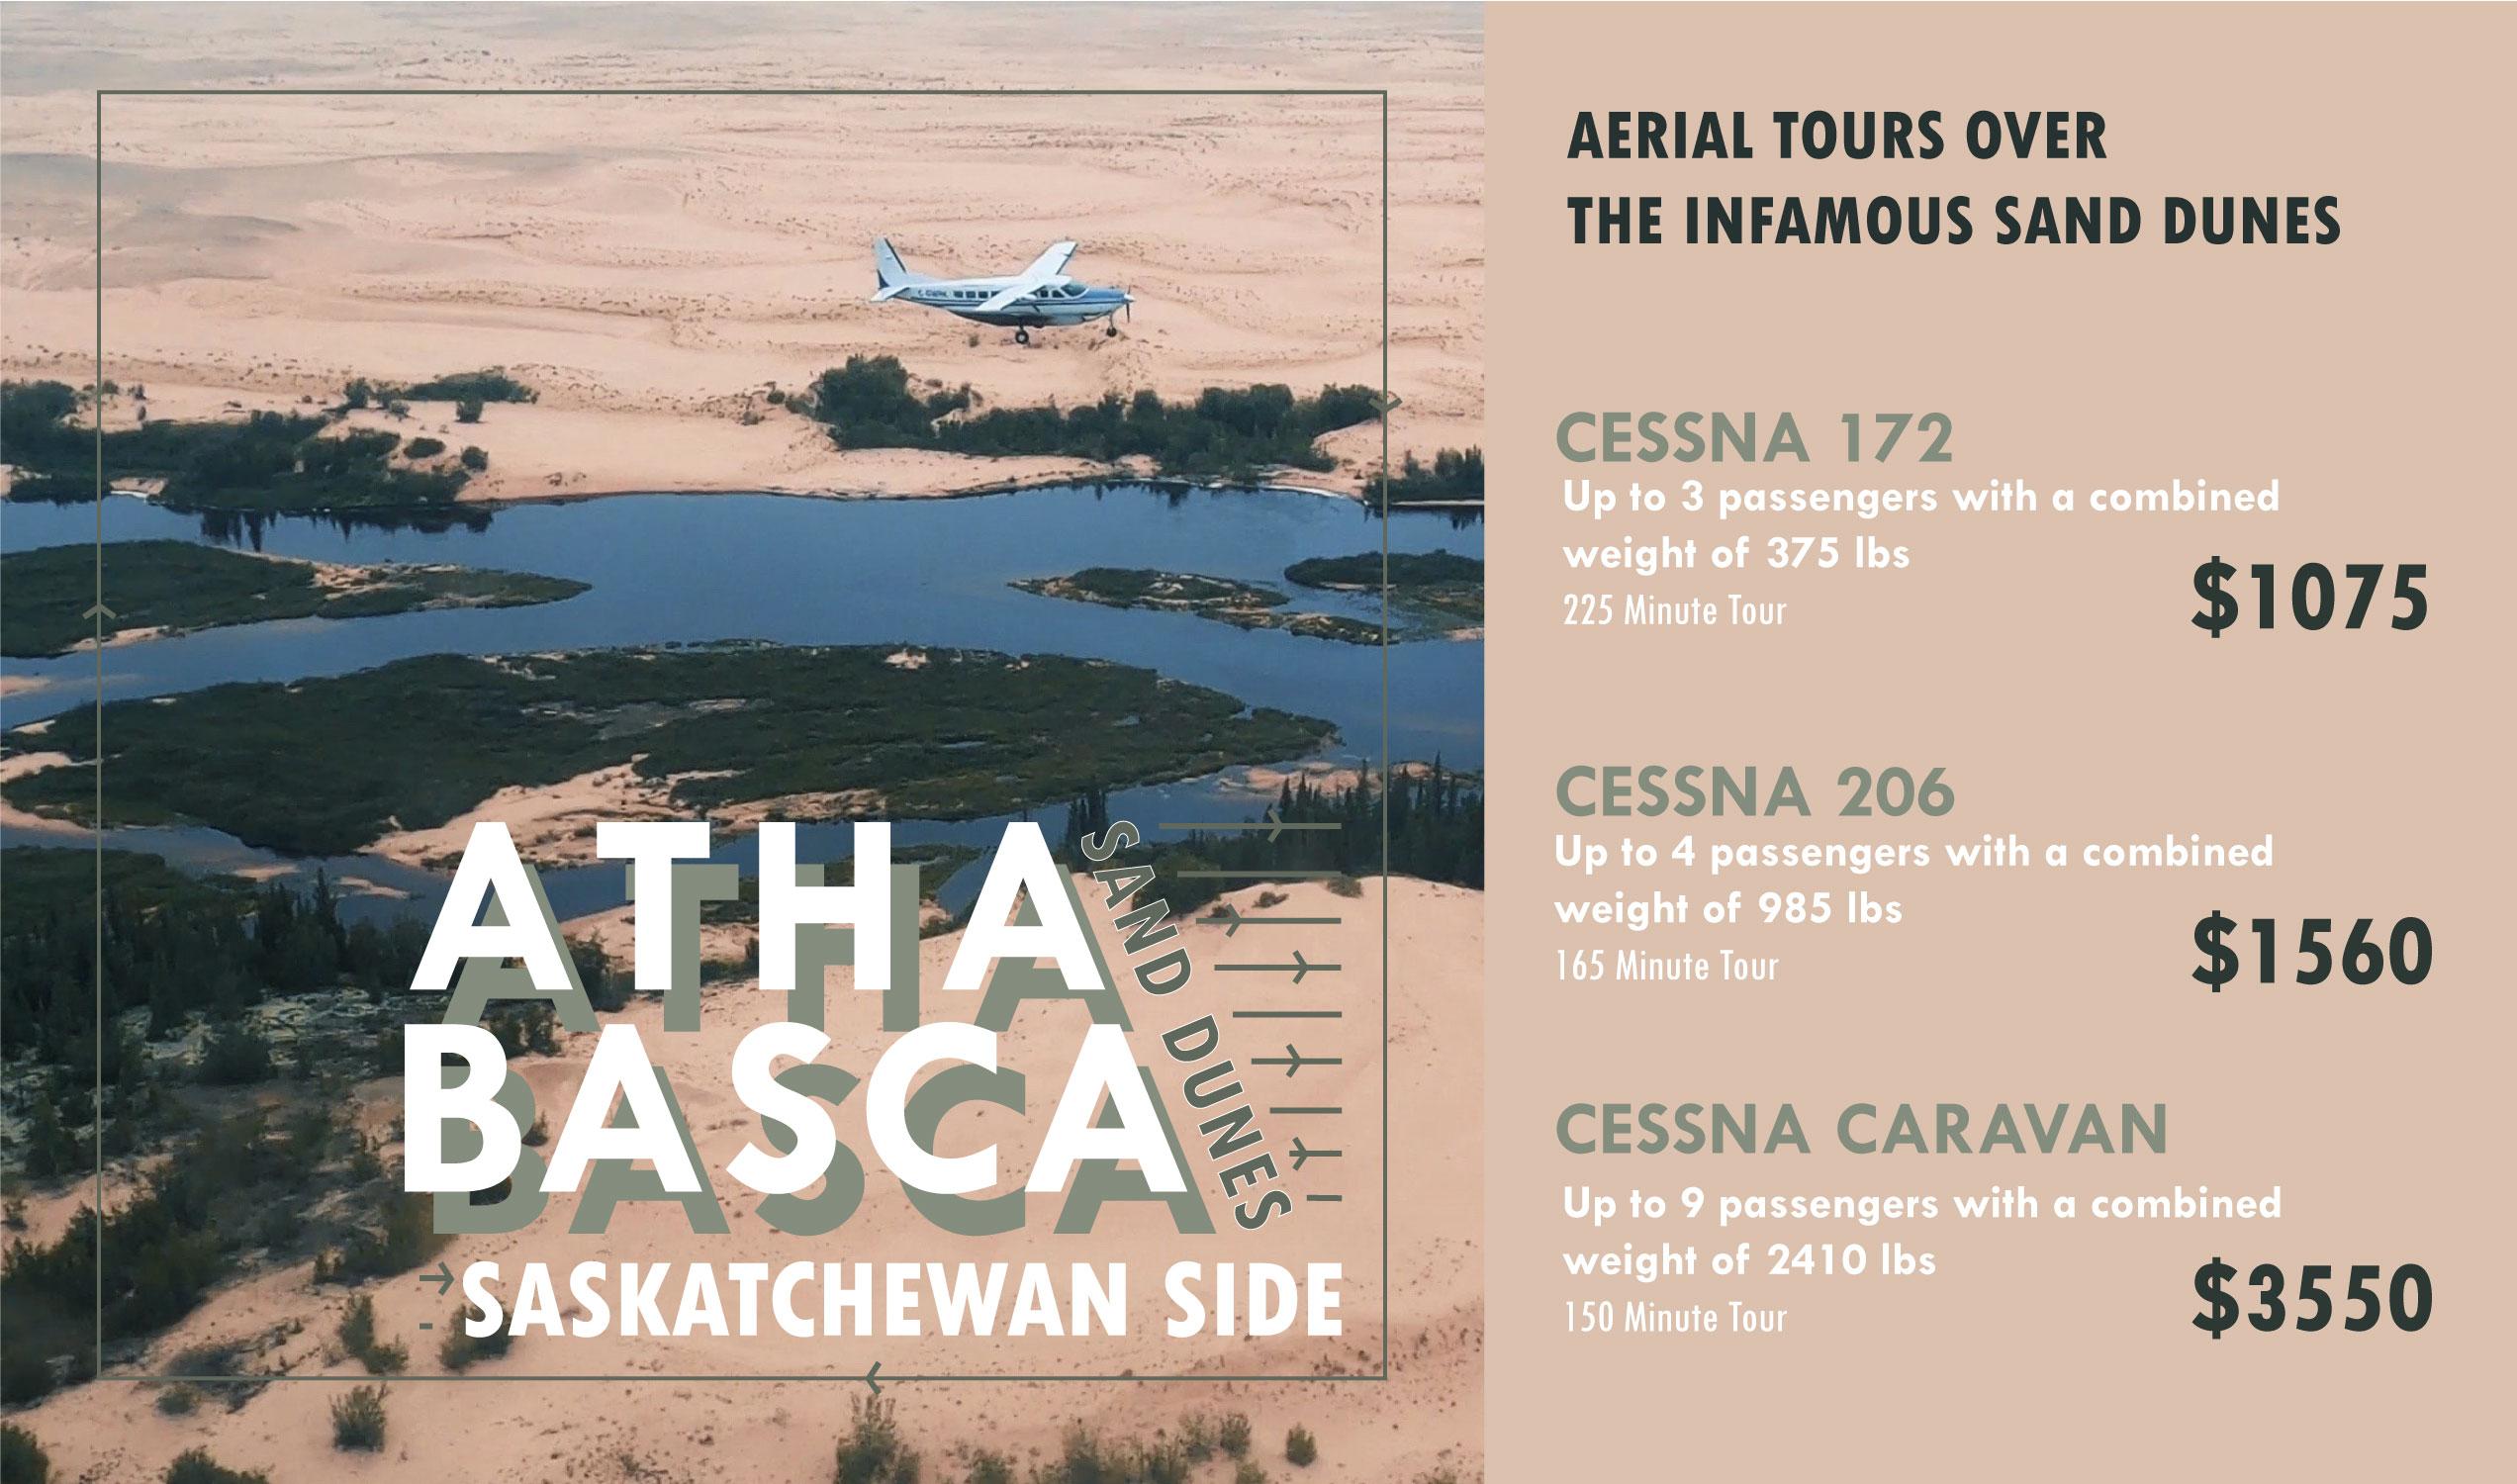 Athabasca Sand Dunes Aerial Tour prices - Saskatchewan side